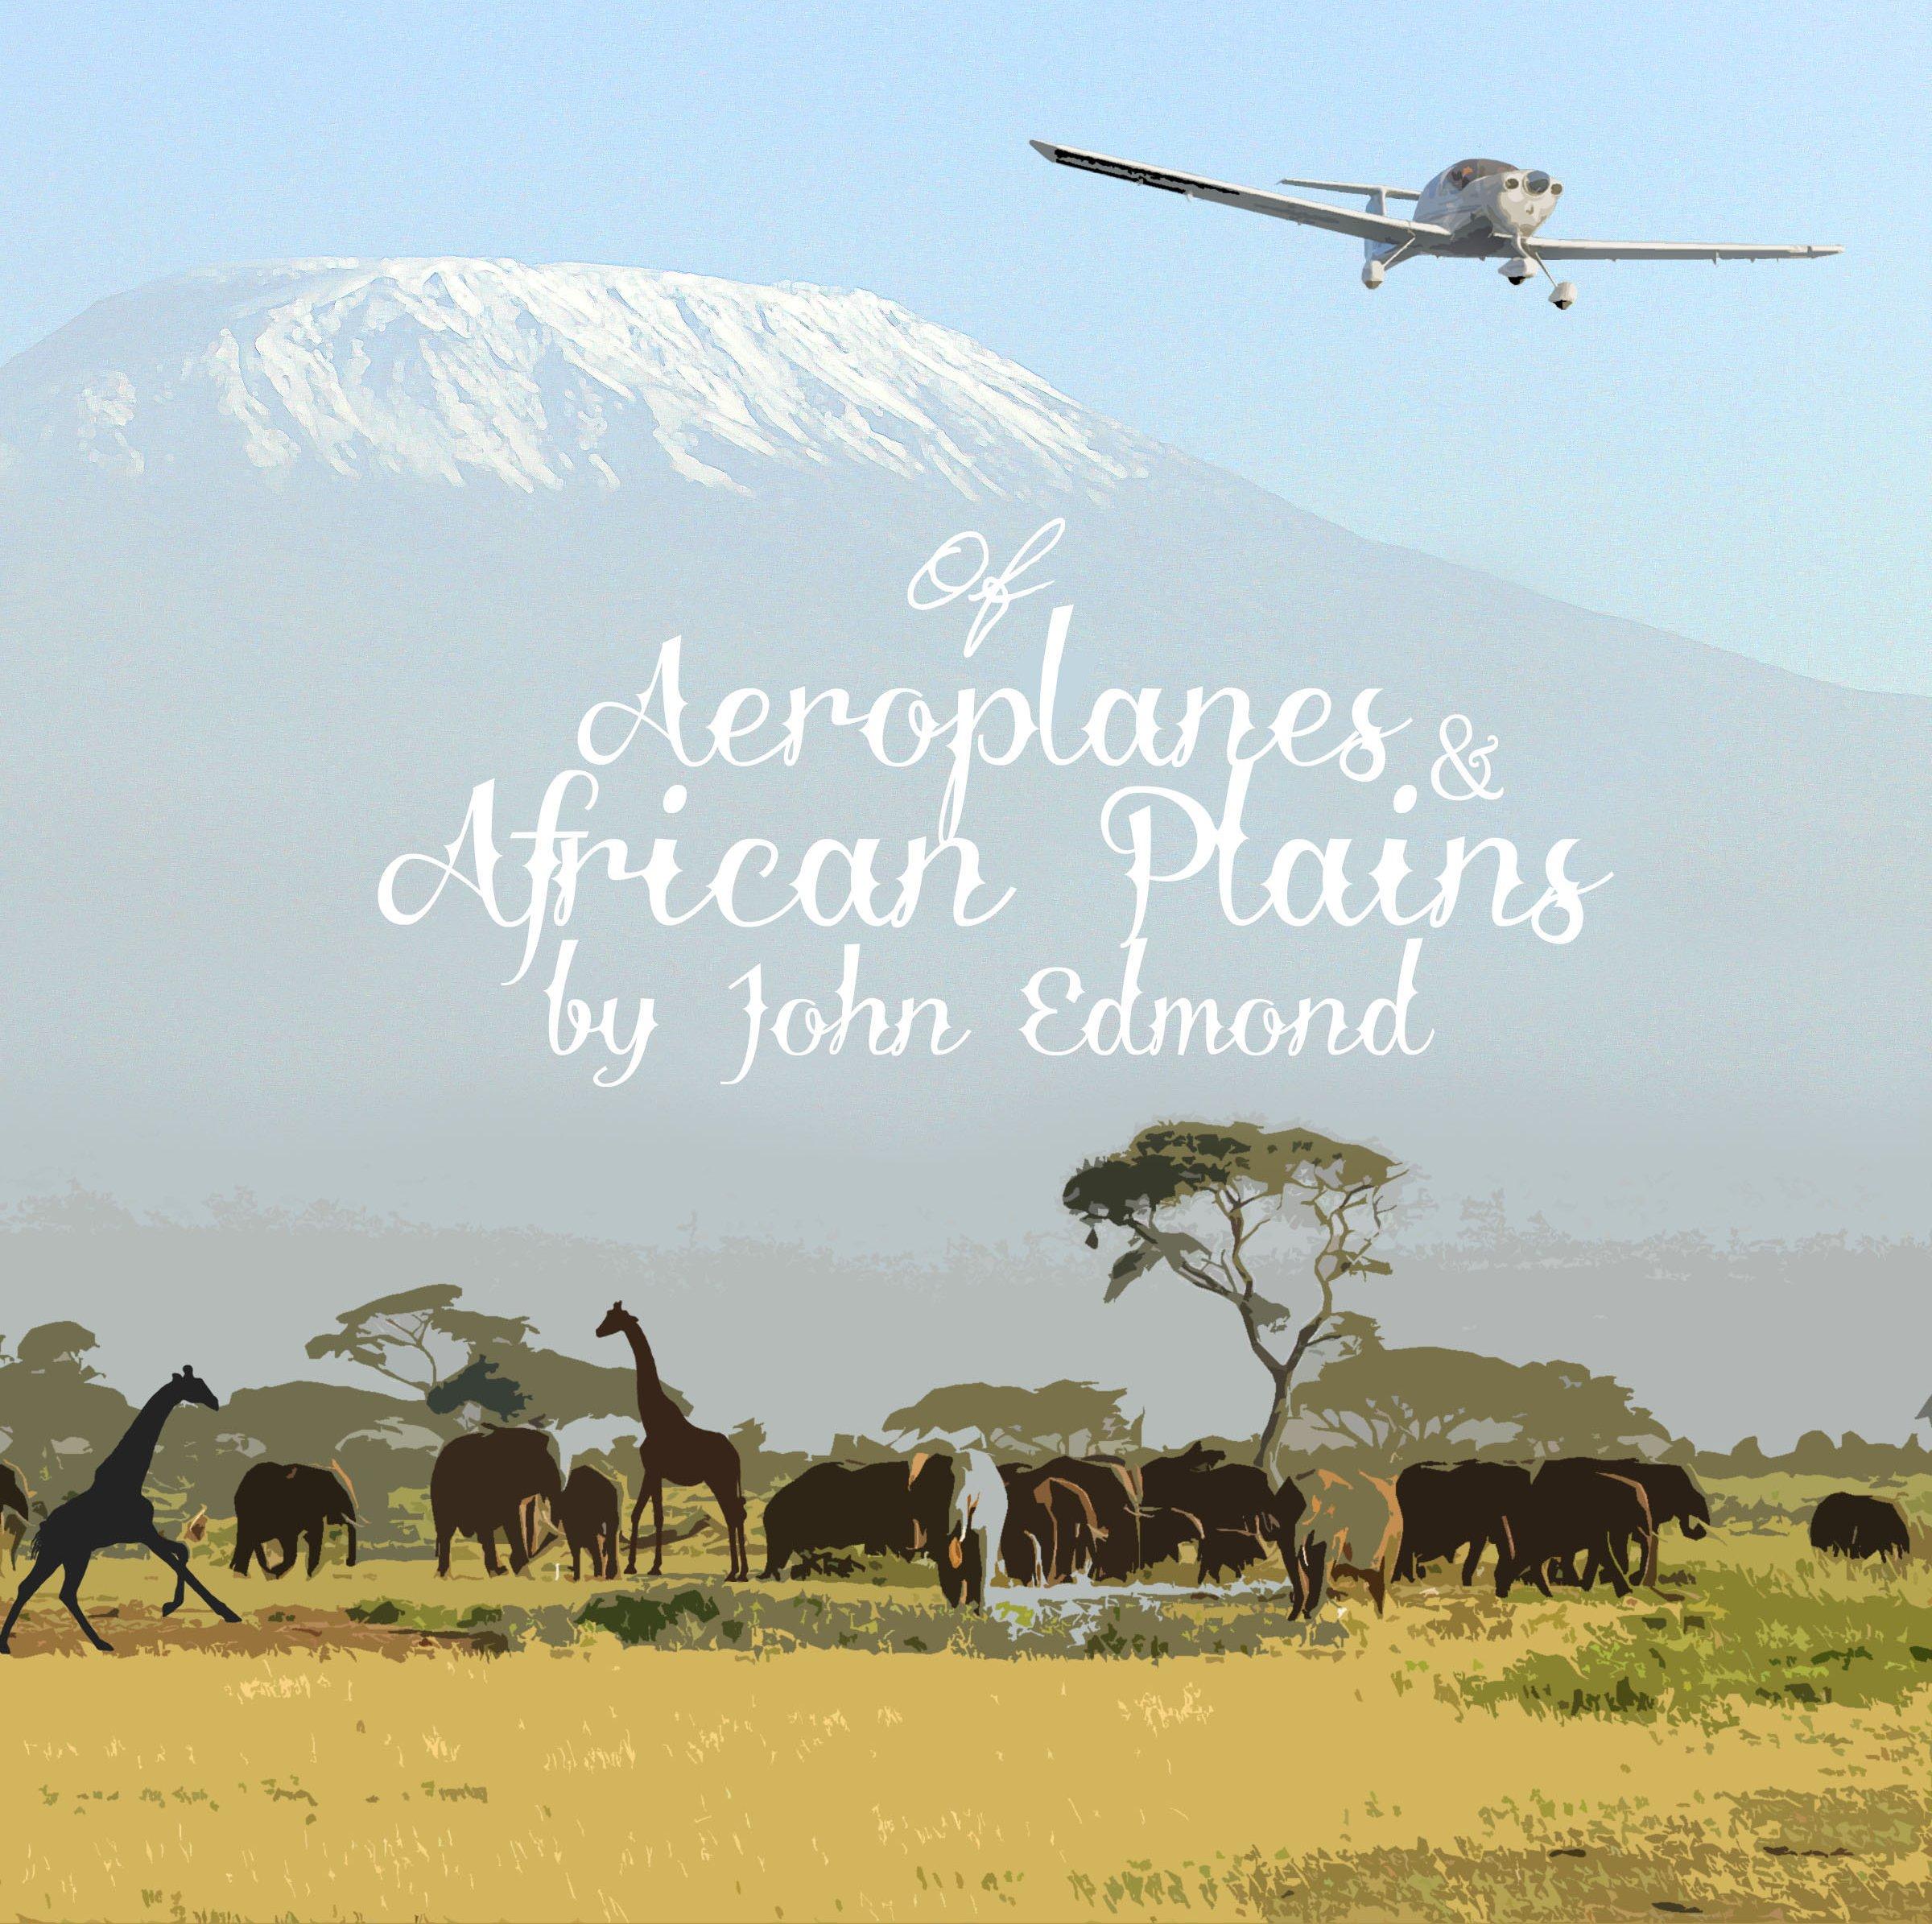 AfricanPlanes.jpg